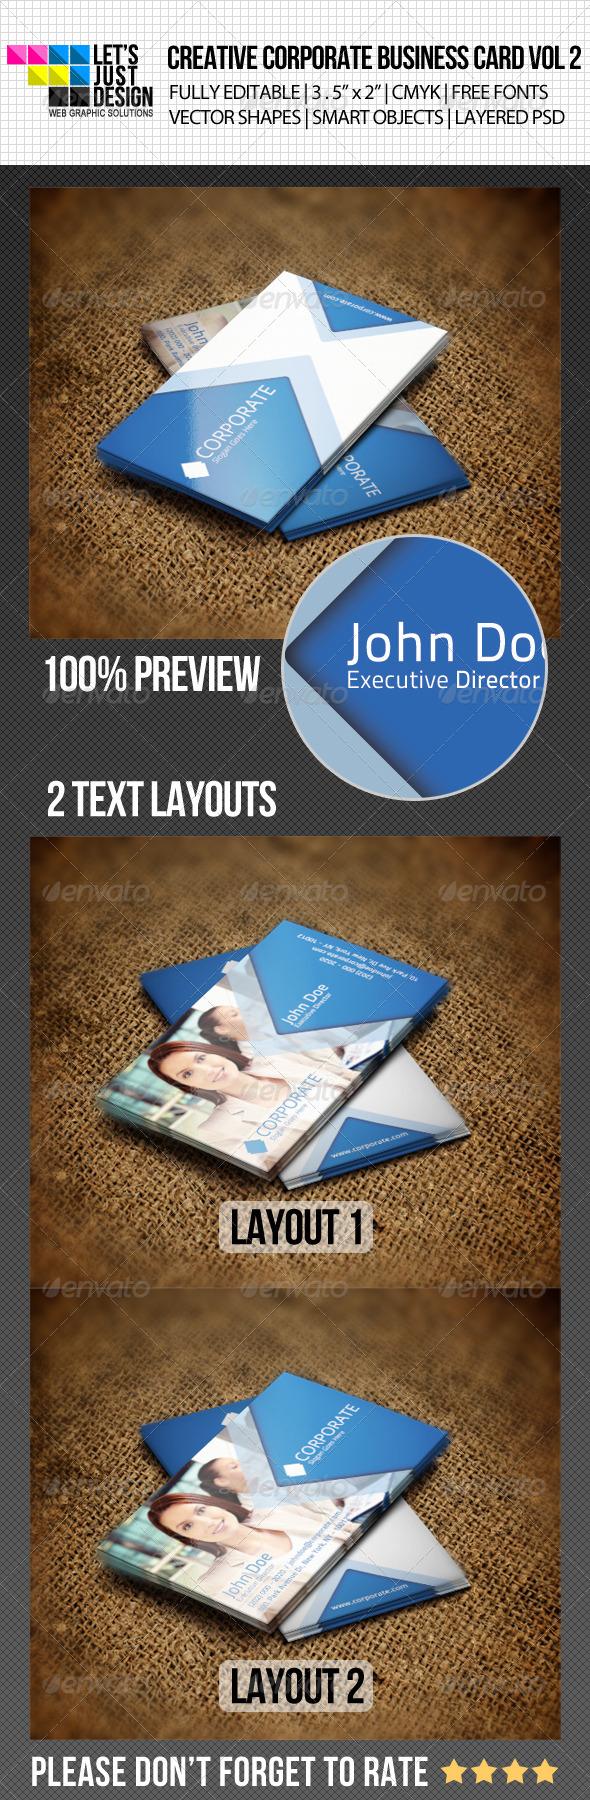 Creative Corporate Business Card Vol 2 - Corporate Business Cards